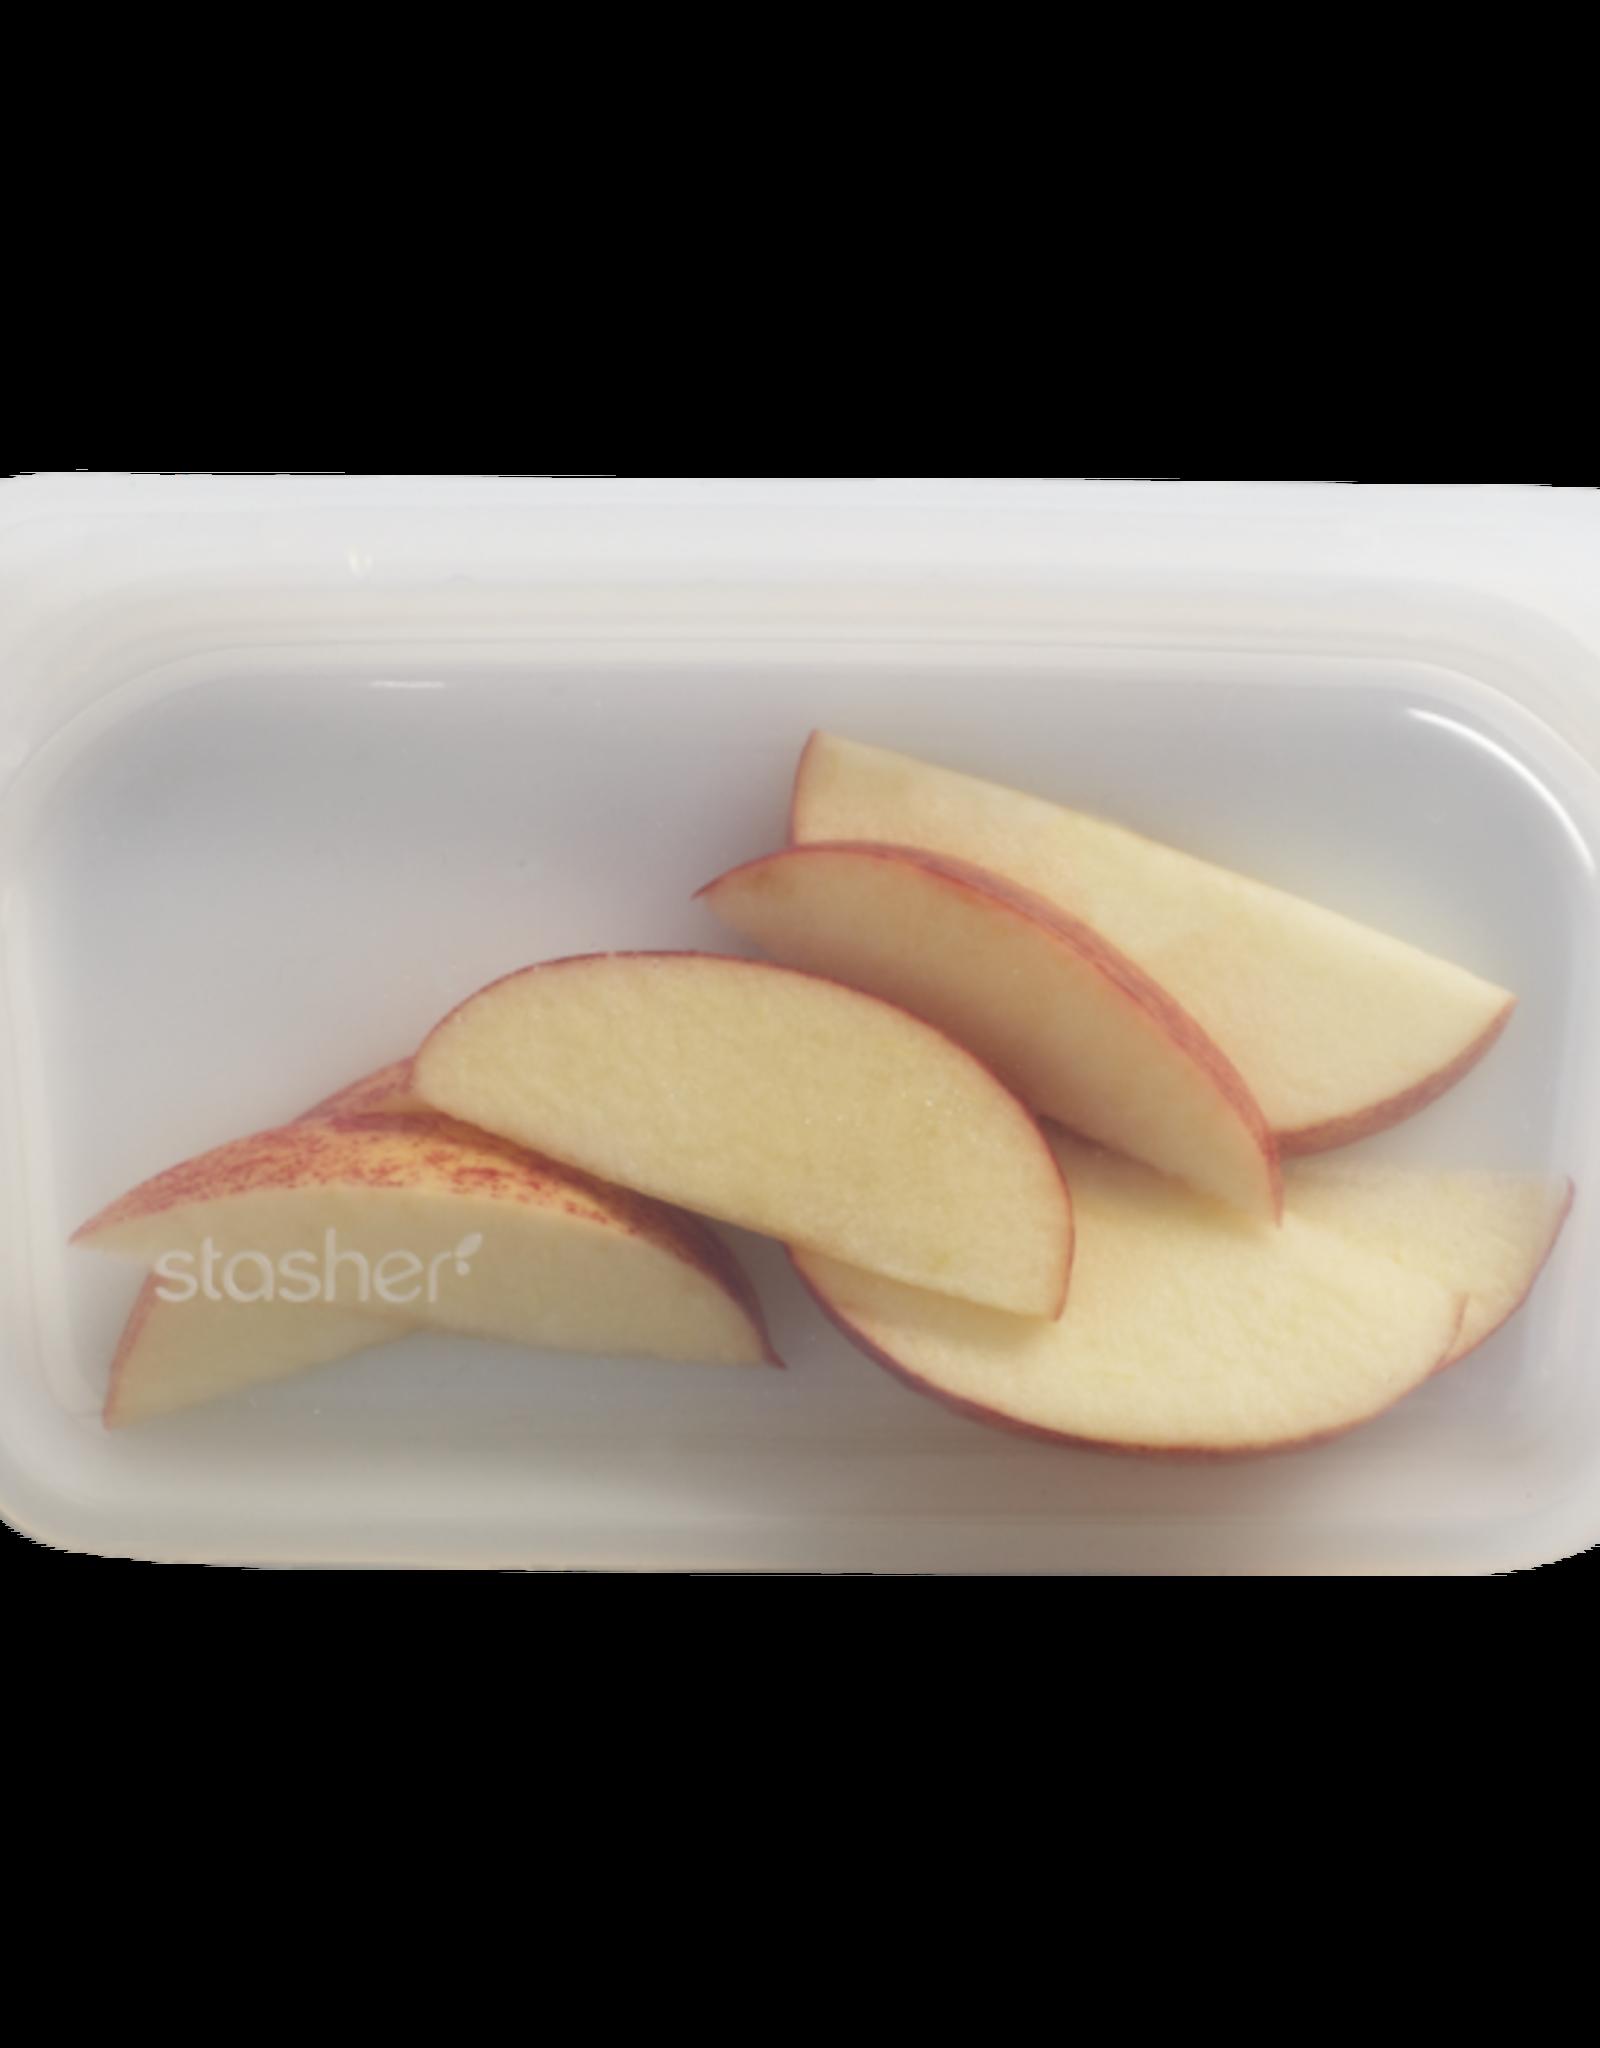 Stasher Bag Stasher bag Snack - Clear